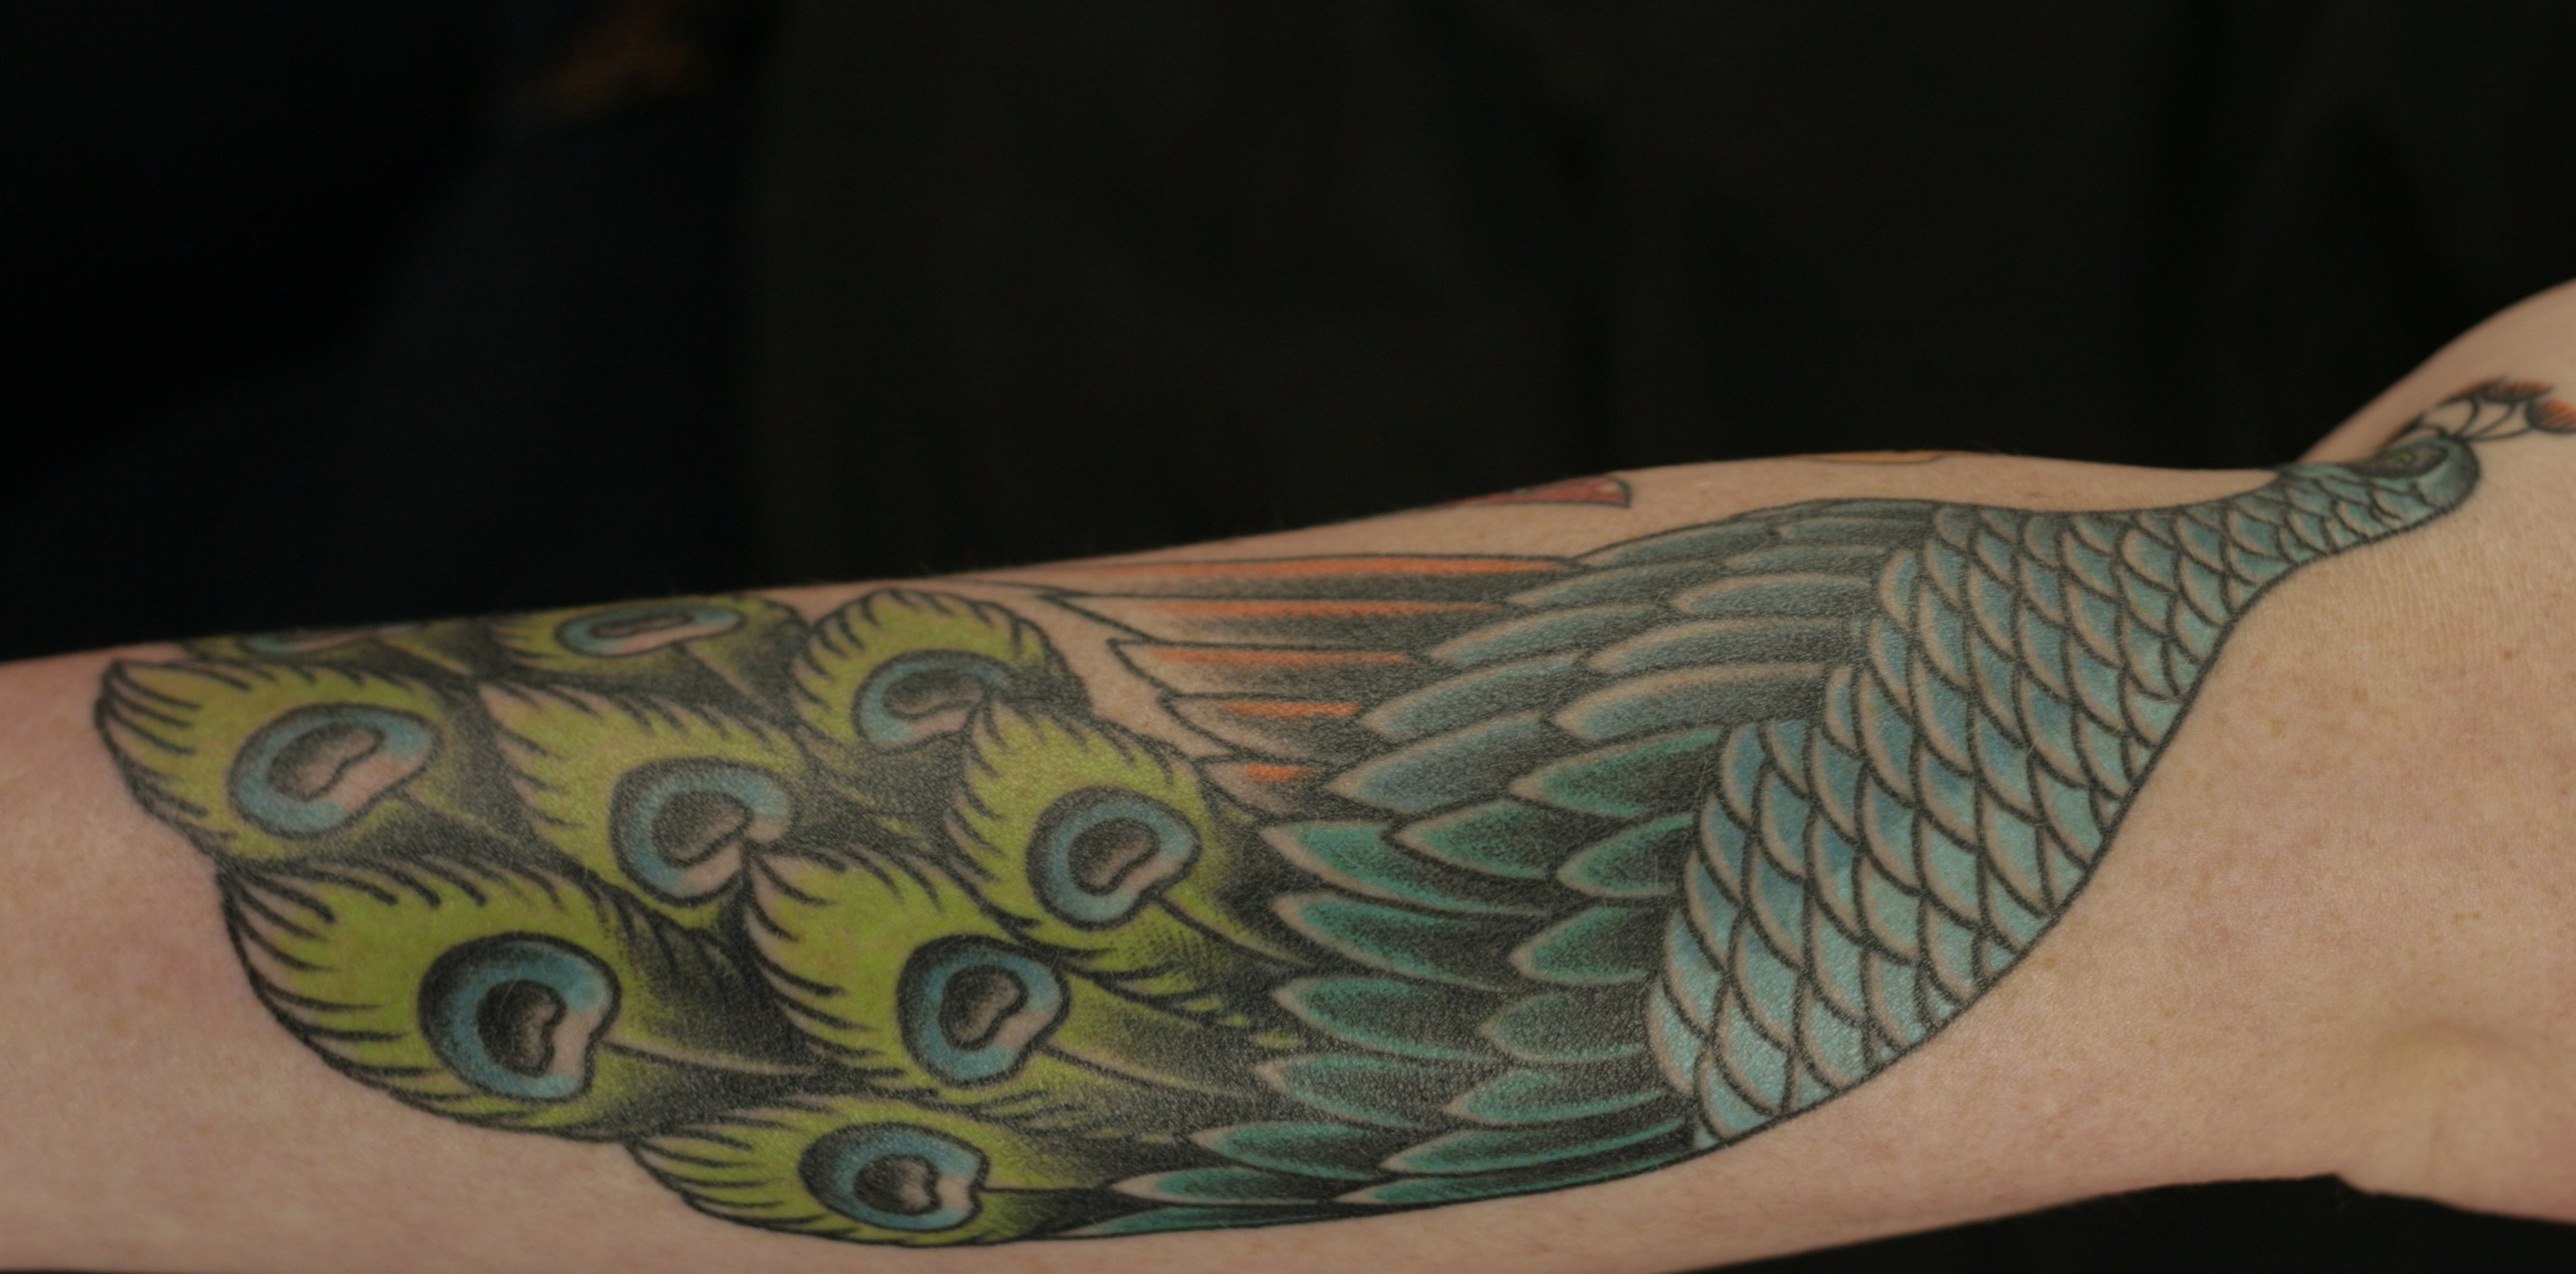 Pfau Tattoo Motive und Pfauenfeder Tattoo Bedeutung alletattoo.de 11